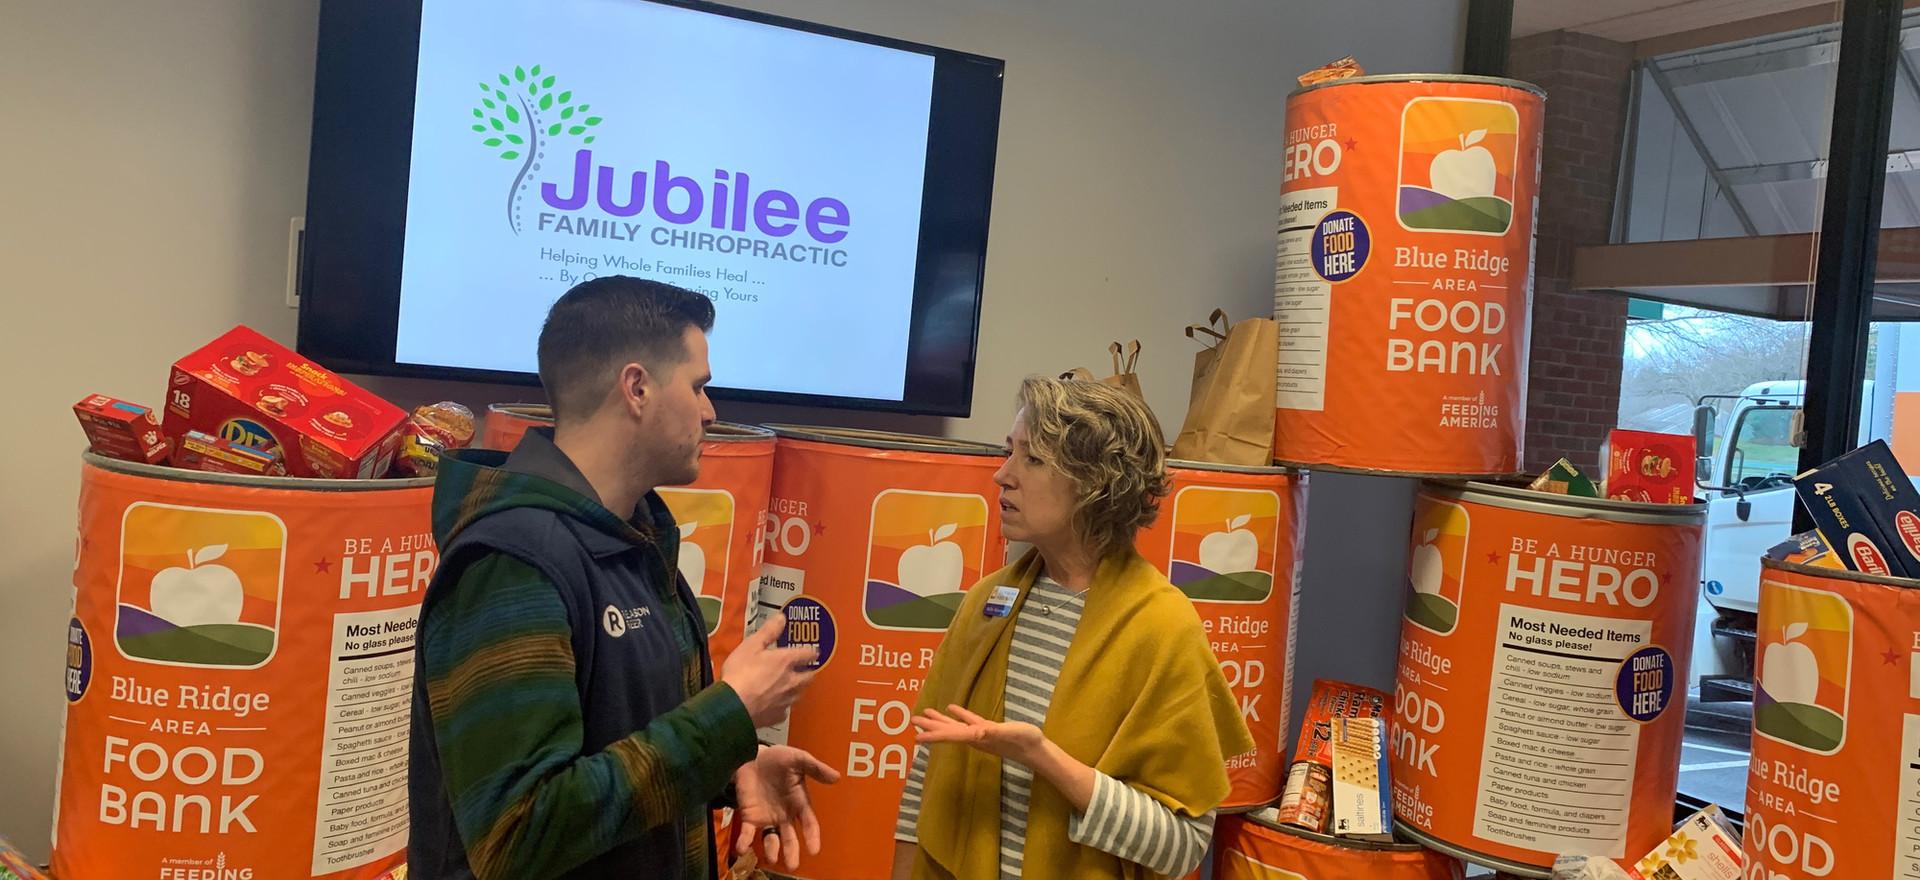 Jubilee Family Chiropractic 2020 Blue Ridge Food Drive. 044